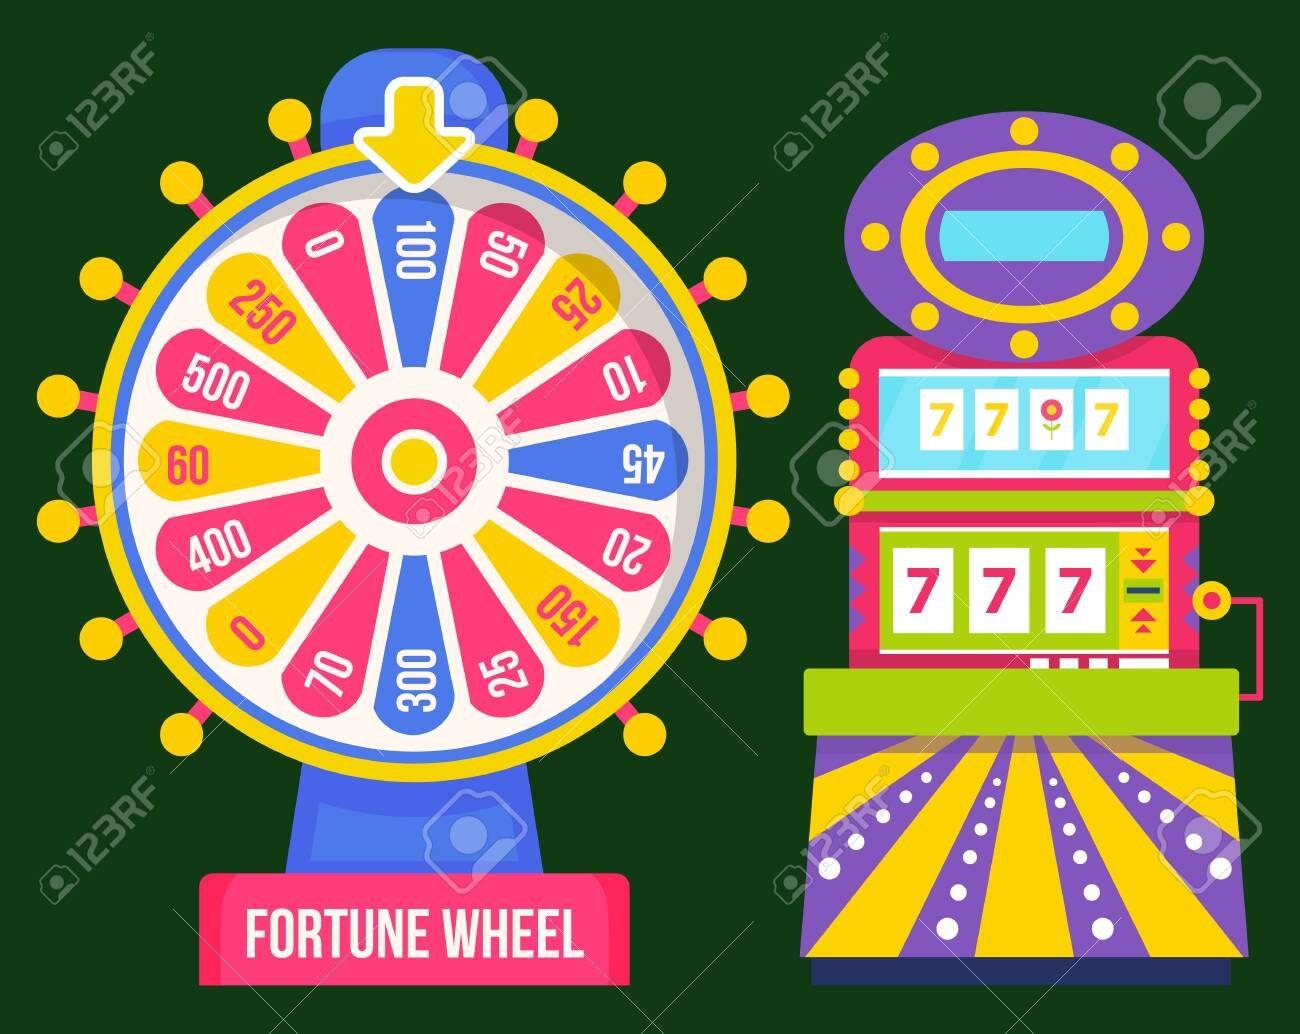 Fortune wheel and gambling machine, 777 jackpot. Vector